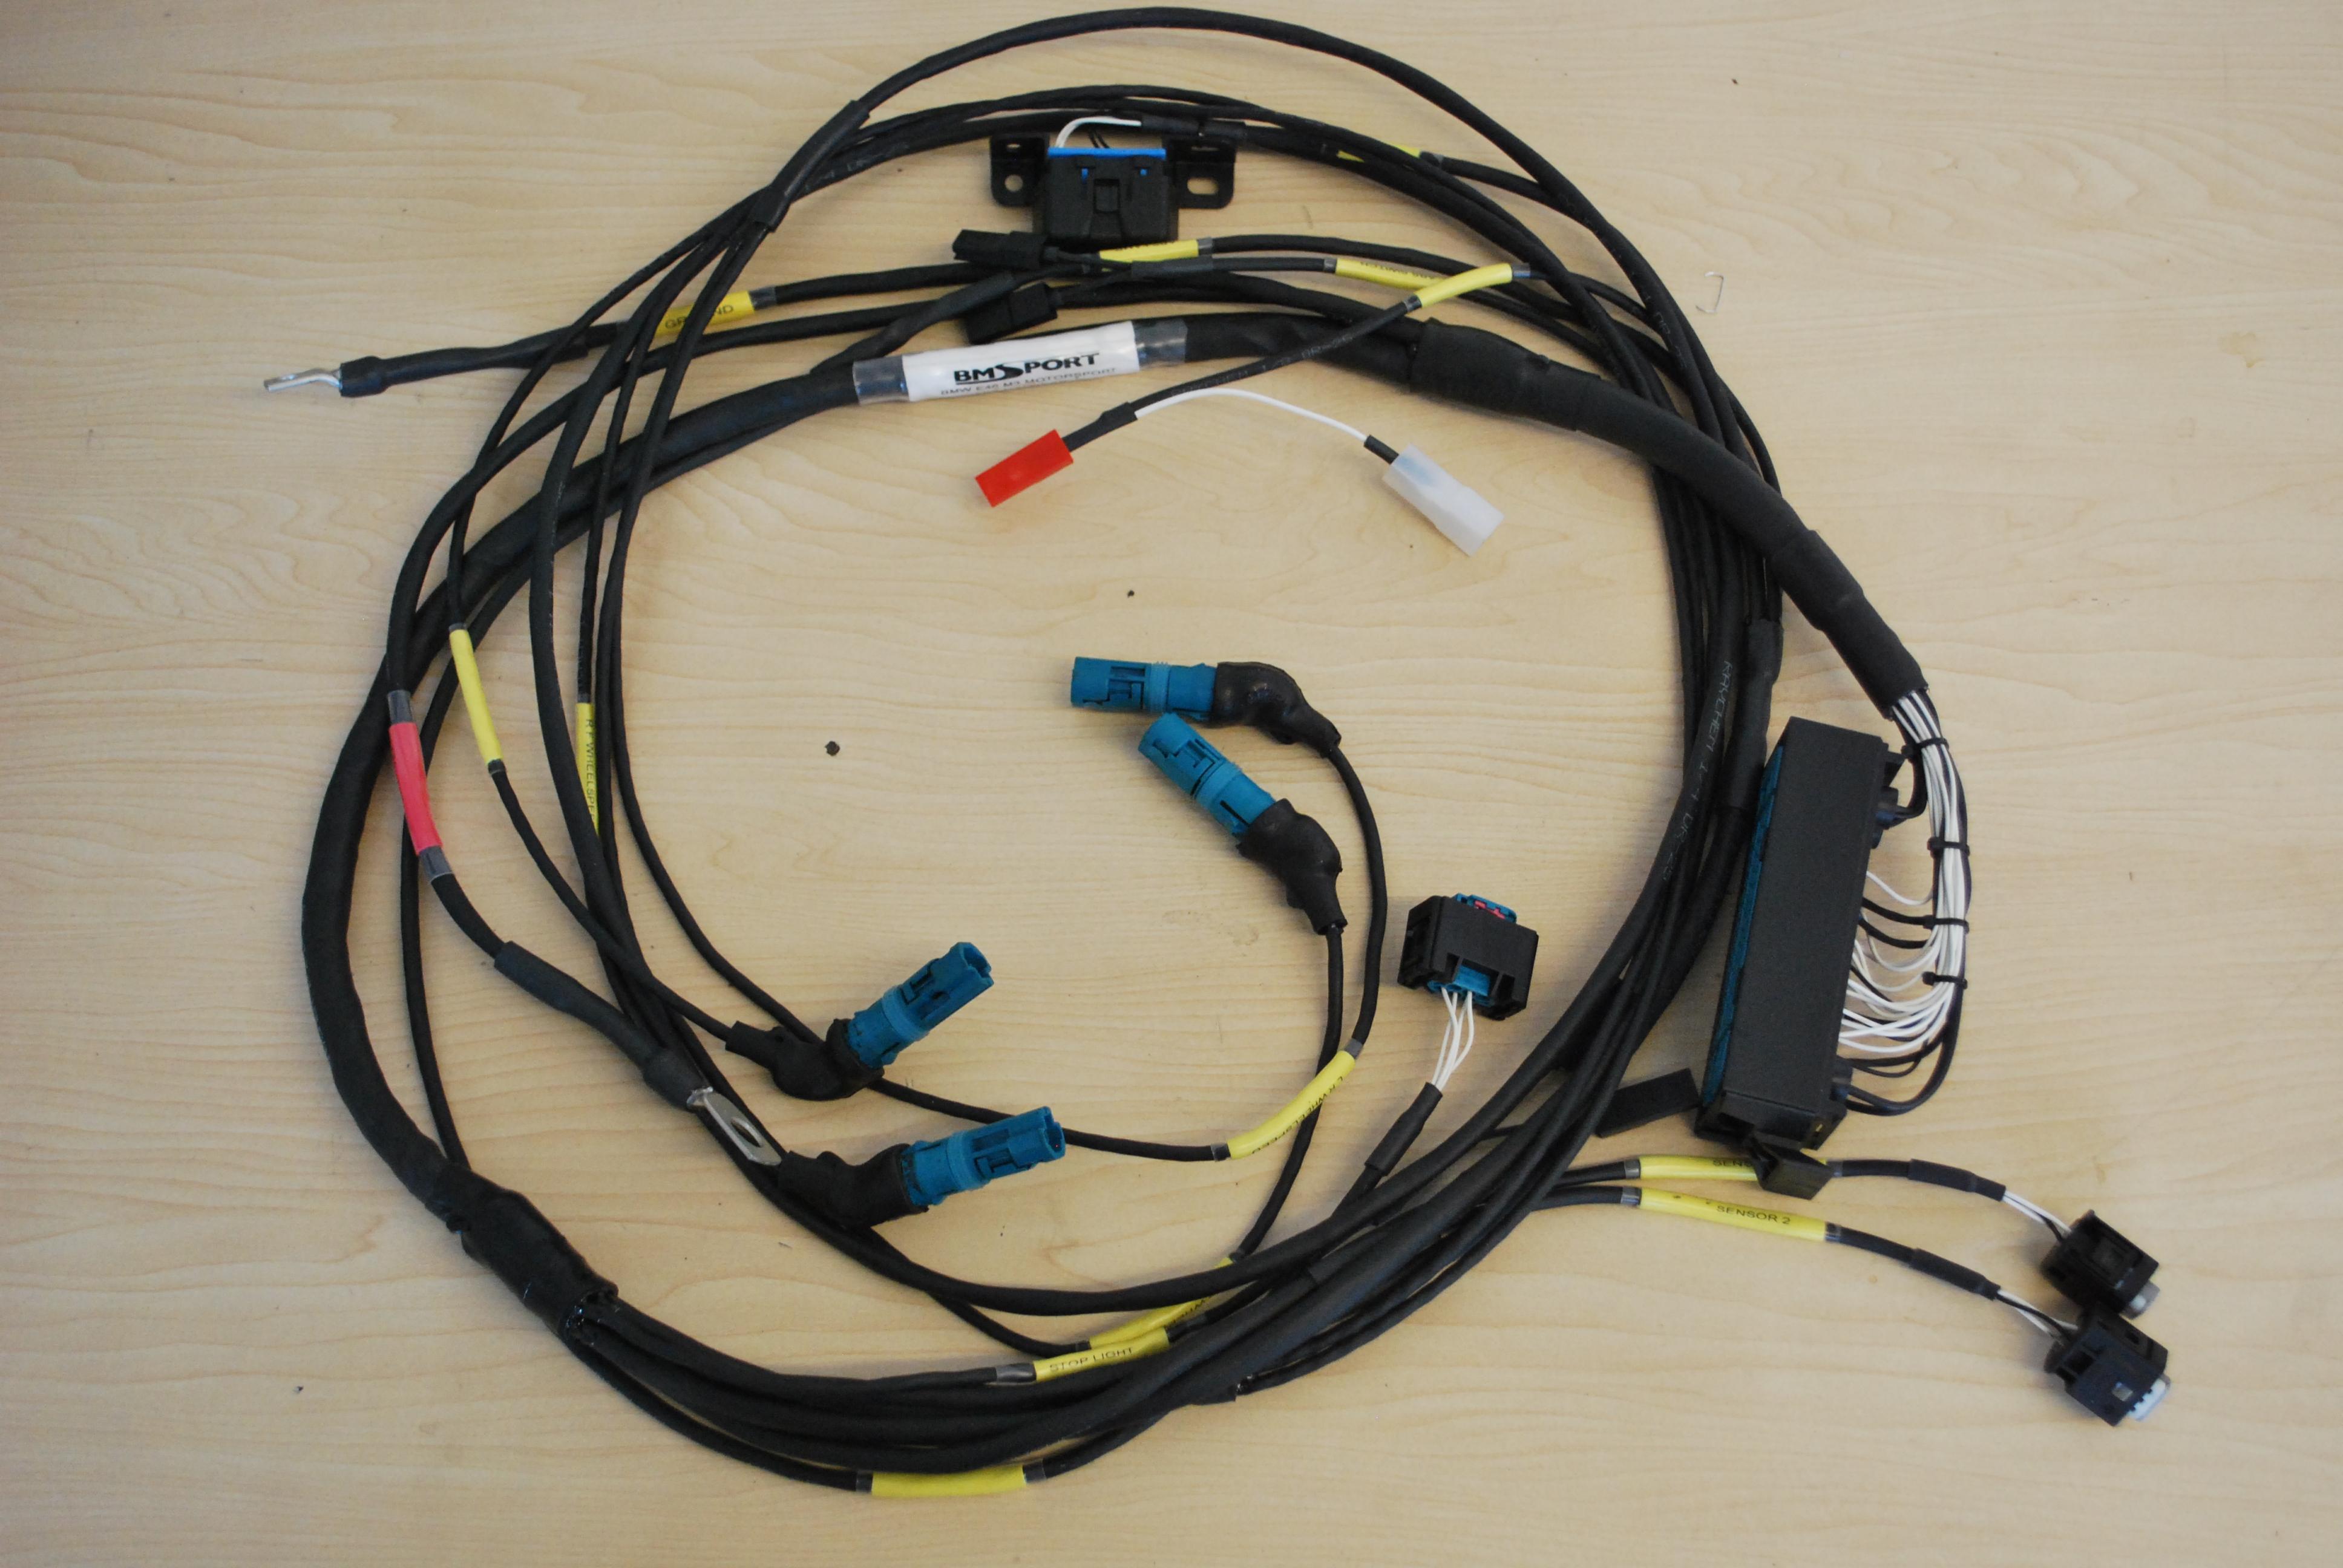 e30 wiring diagram radio 2008 toyota tundra parts bmw loom qt4 preistastisch de pio schullieder u2022 rh 325i 320i